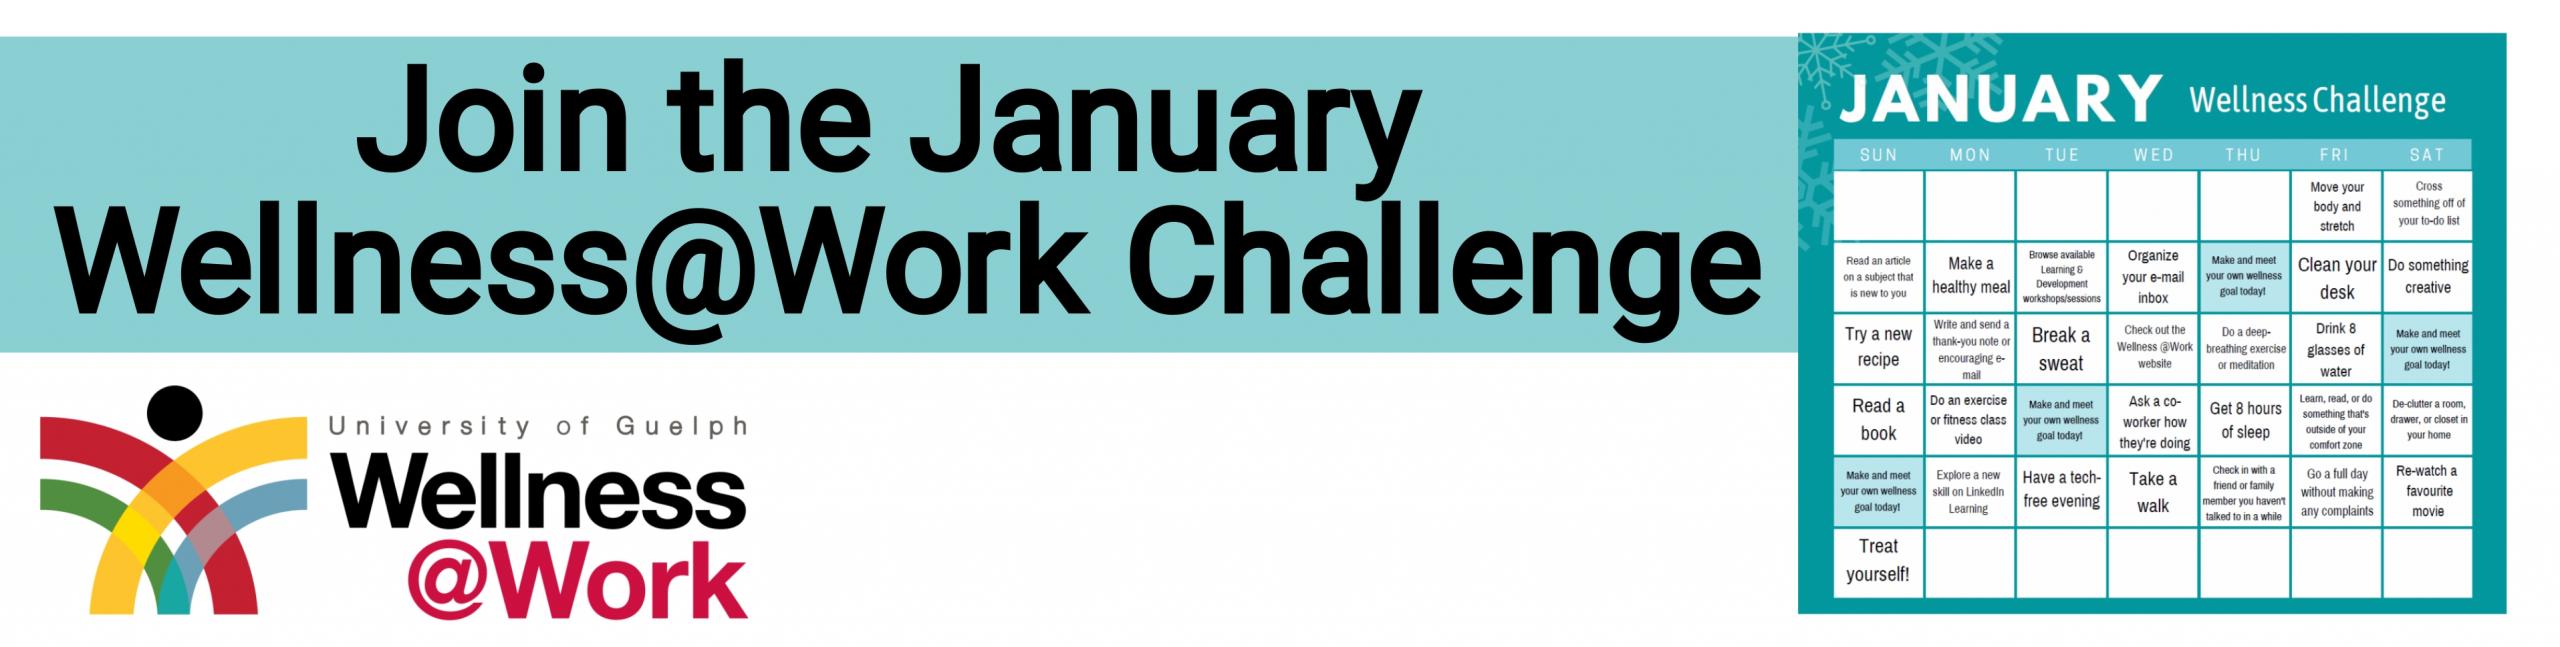 Wellness@Work |-Monthly Wellness 2021